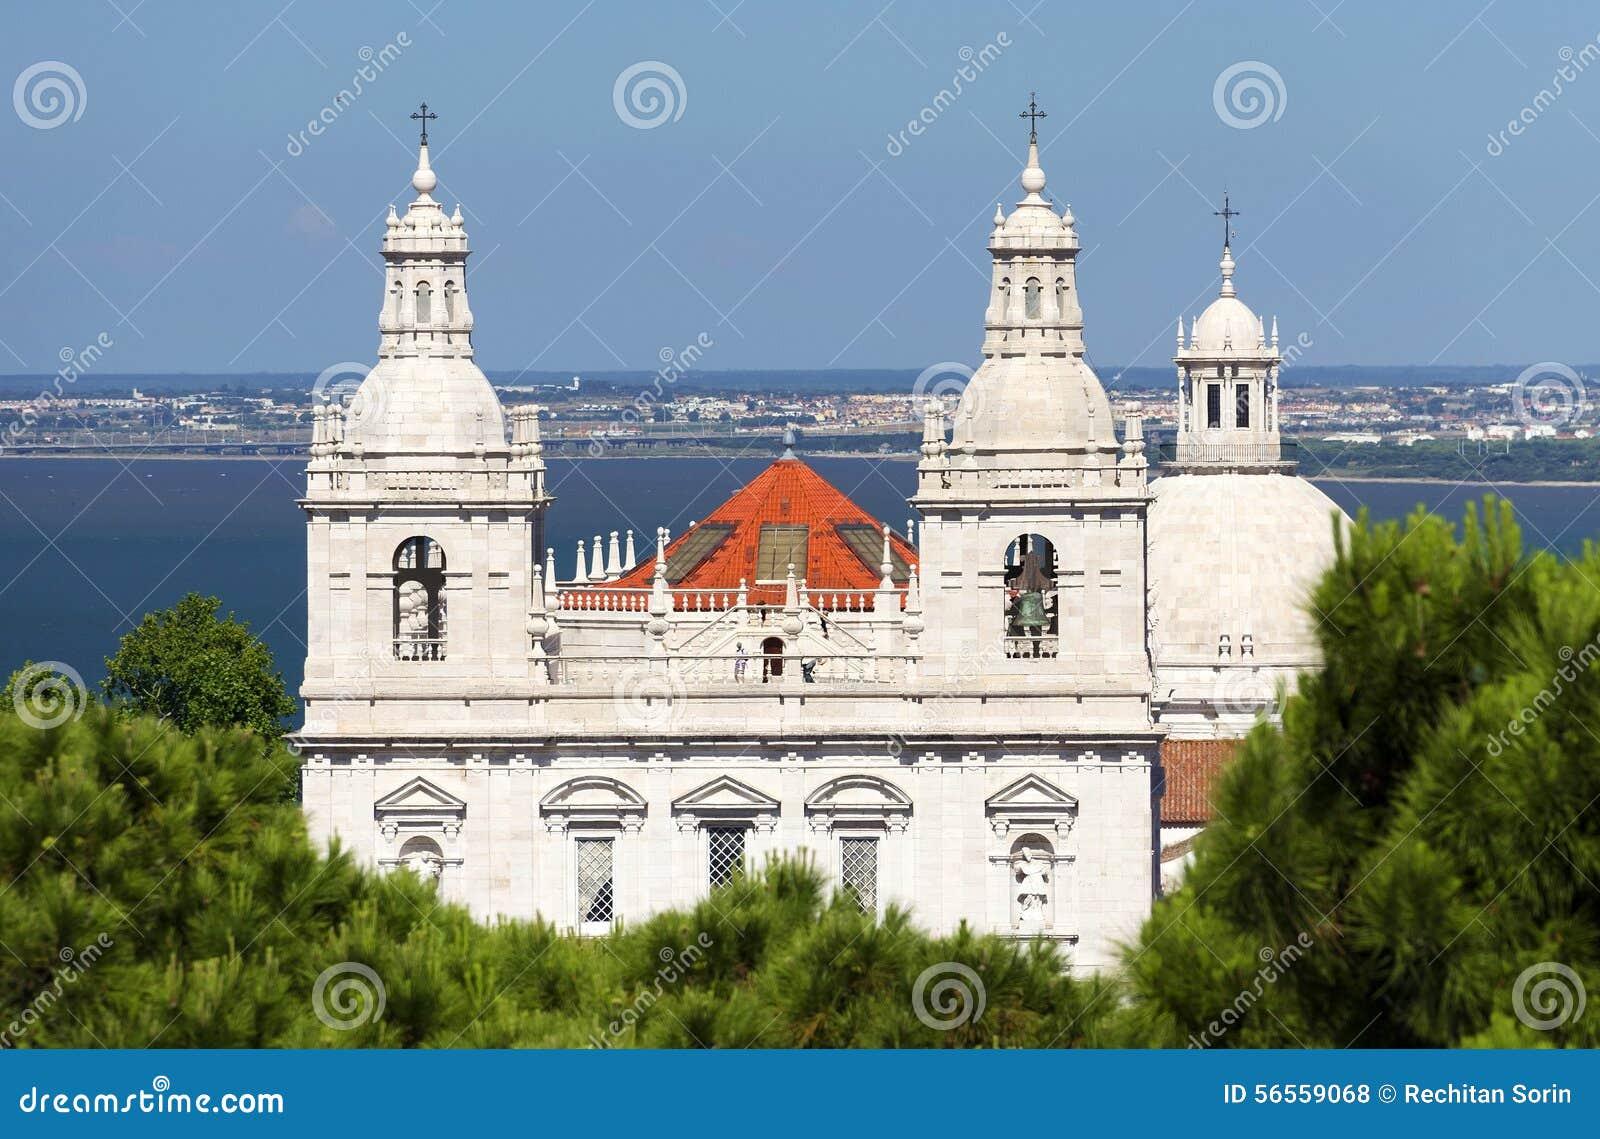 Download Αρχιτεκτονική λεπτομέρεια στη Λισσαβώνα Στοκ Εικόνες - εικόνα από cityscape, φυσικός: 56559068